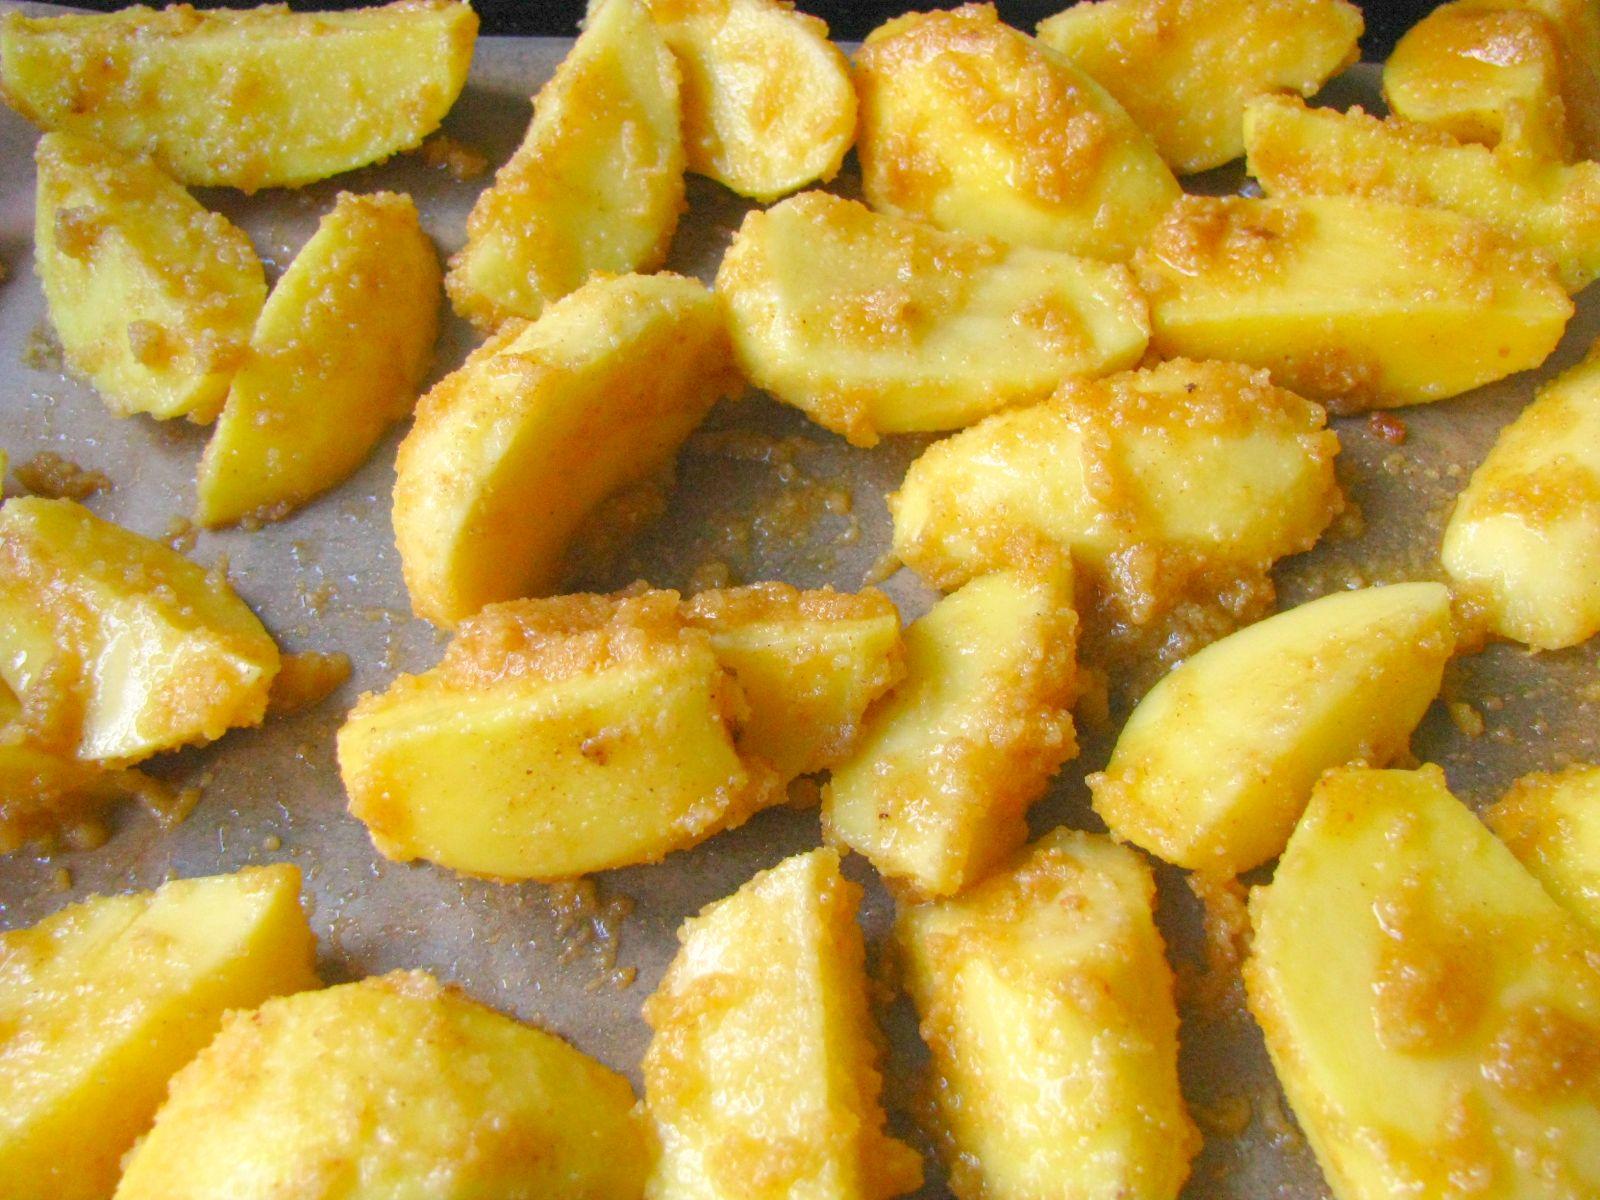 struhankove krumple pred pecenim